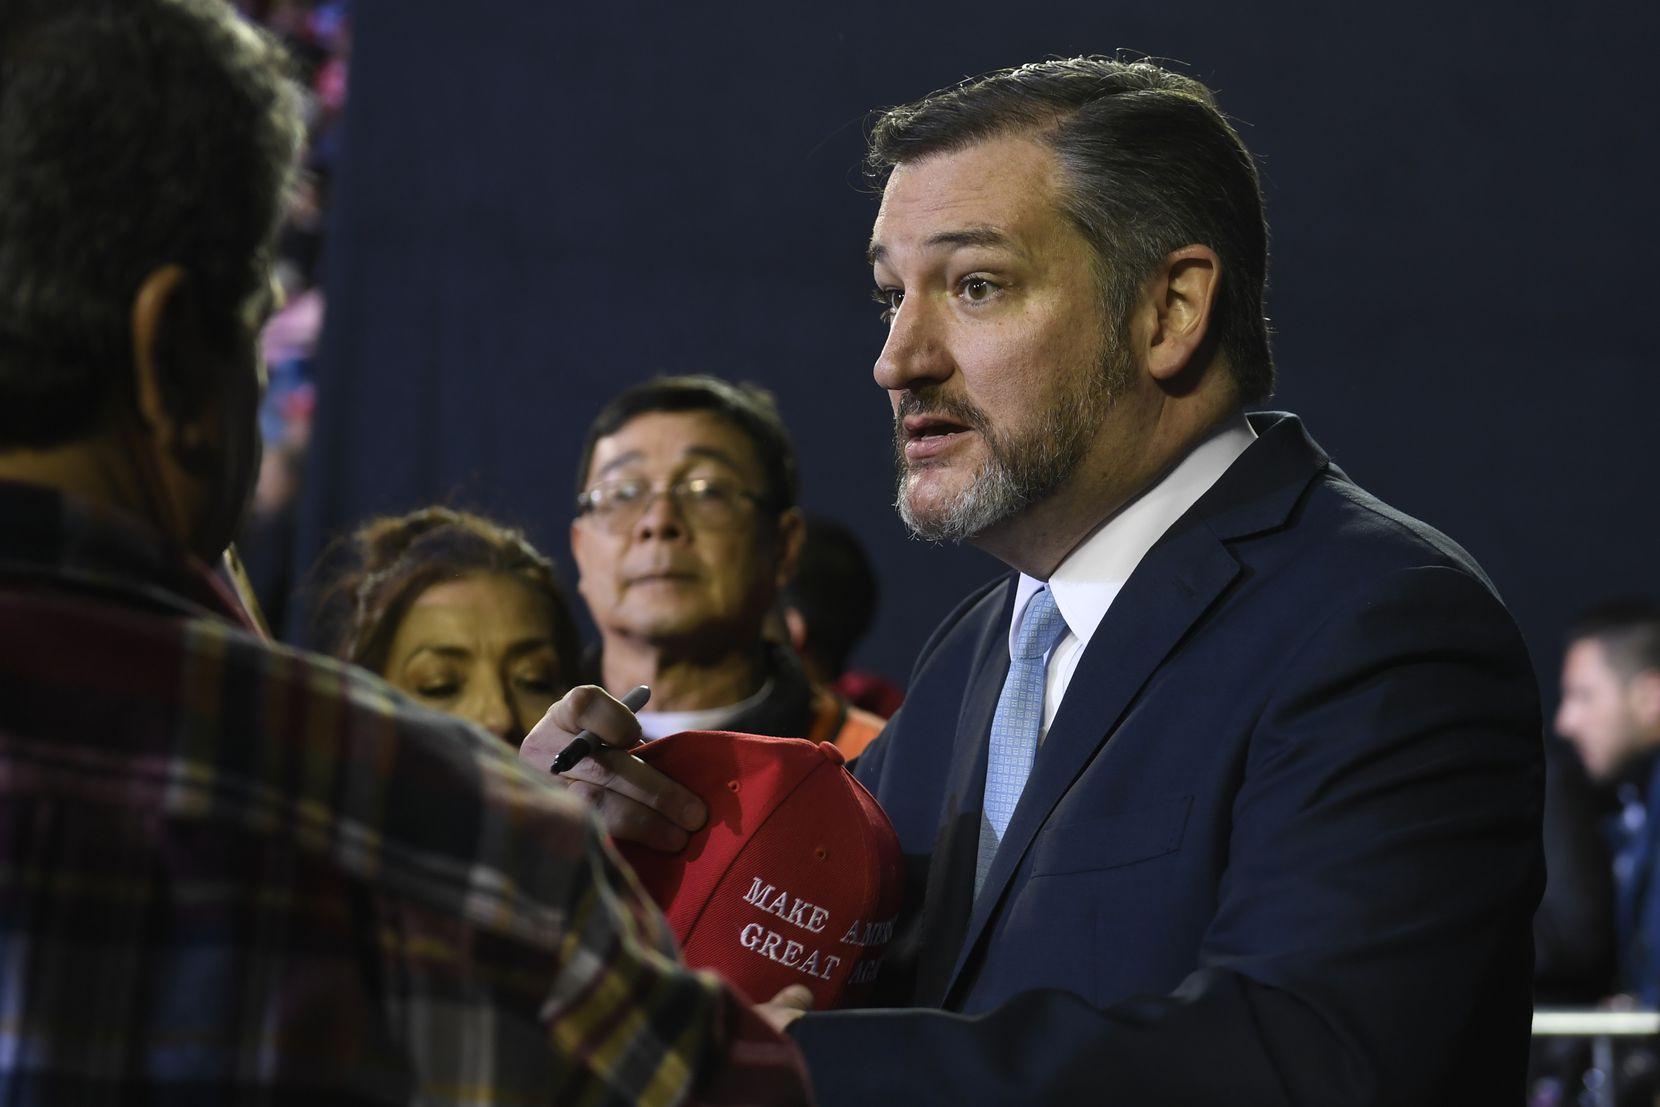 Sen. Ted Cruz, R-Texas, attends a rally with President Donald Trump in El Paso, Texas, Monday, Feb. 11, 2019. . (AP Photo/Susan Walsh)